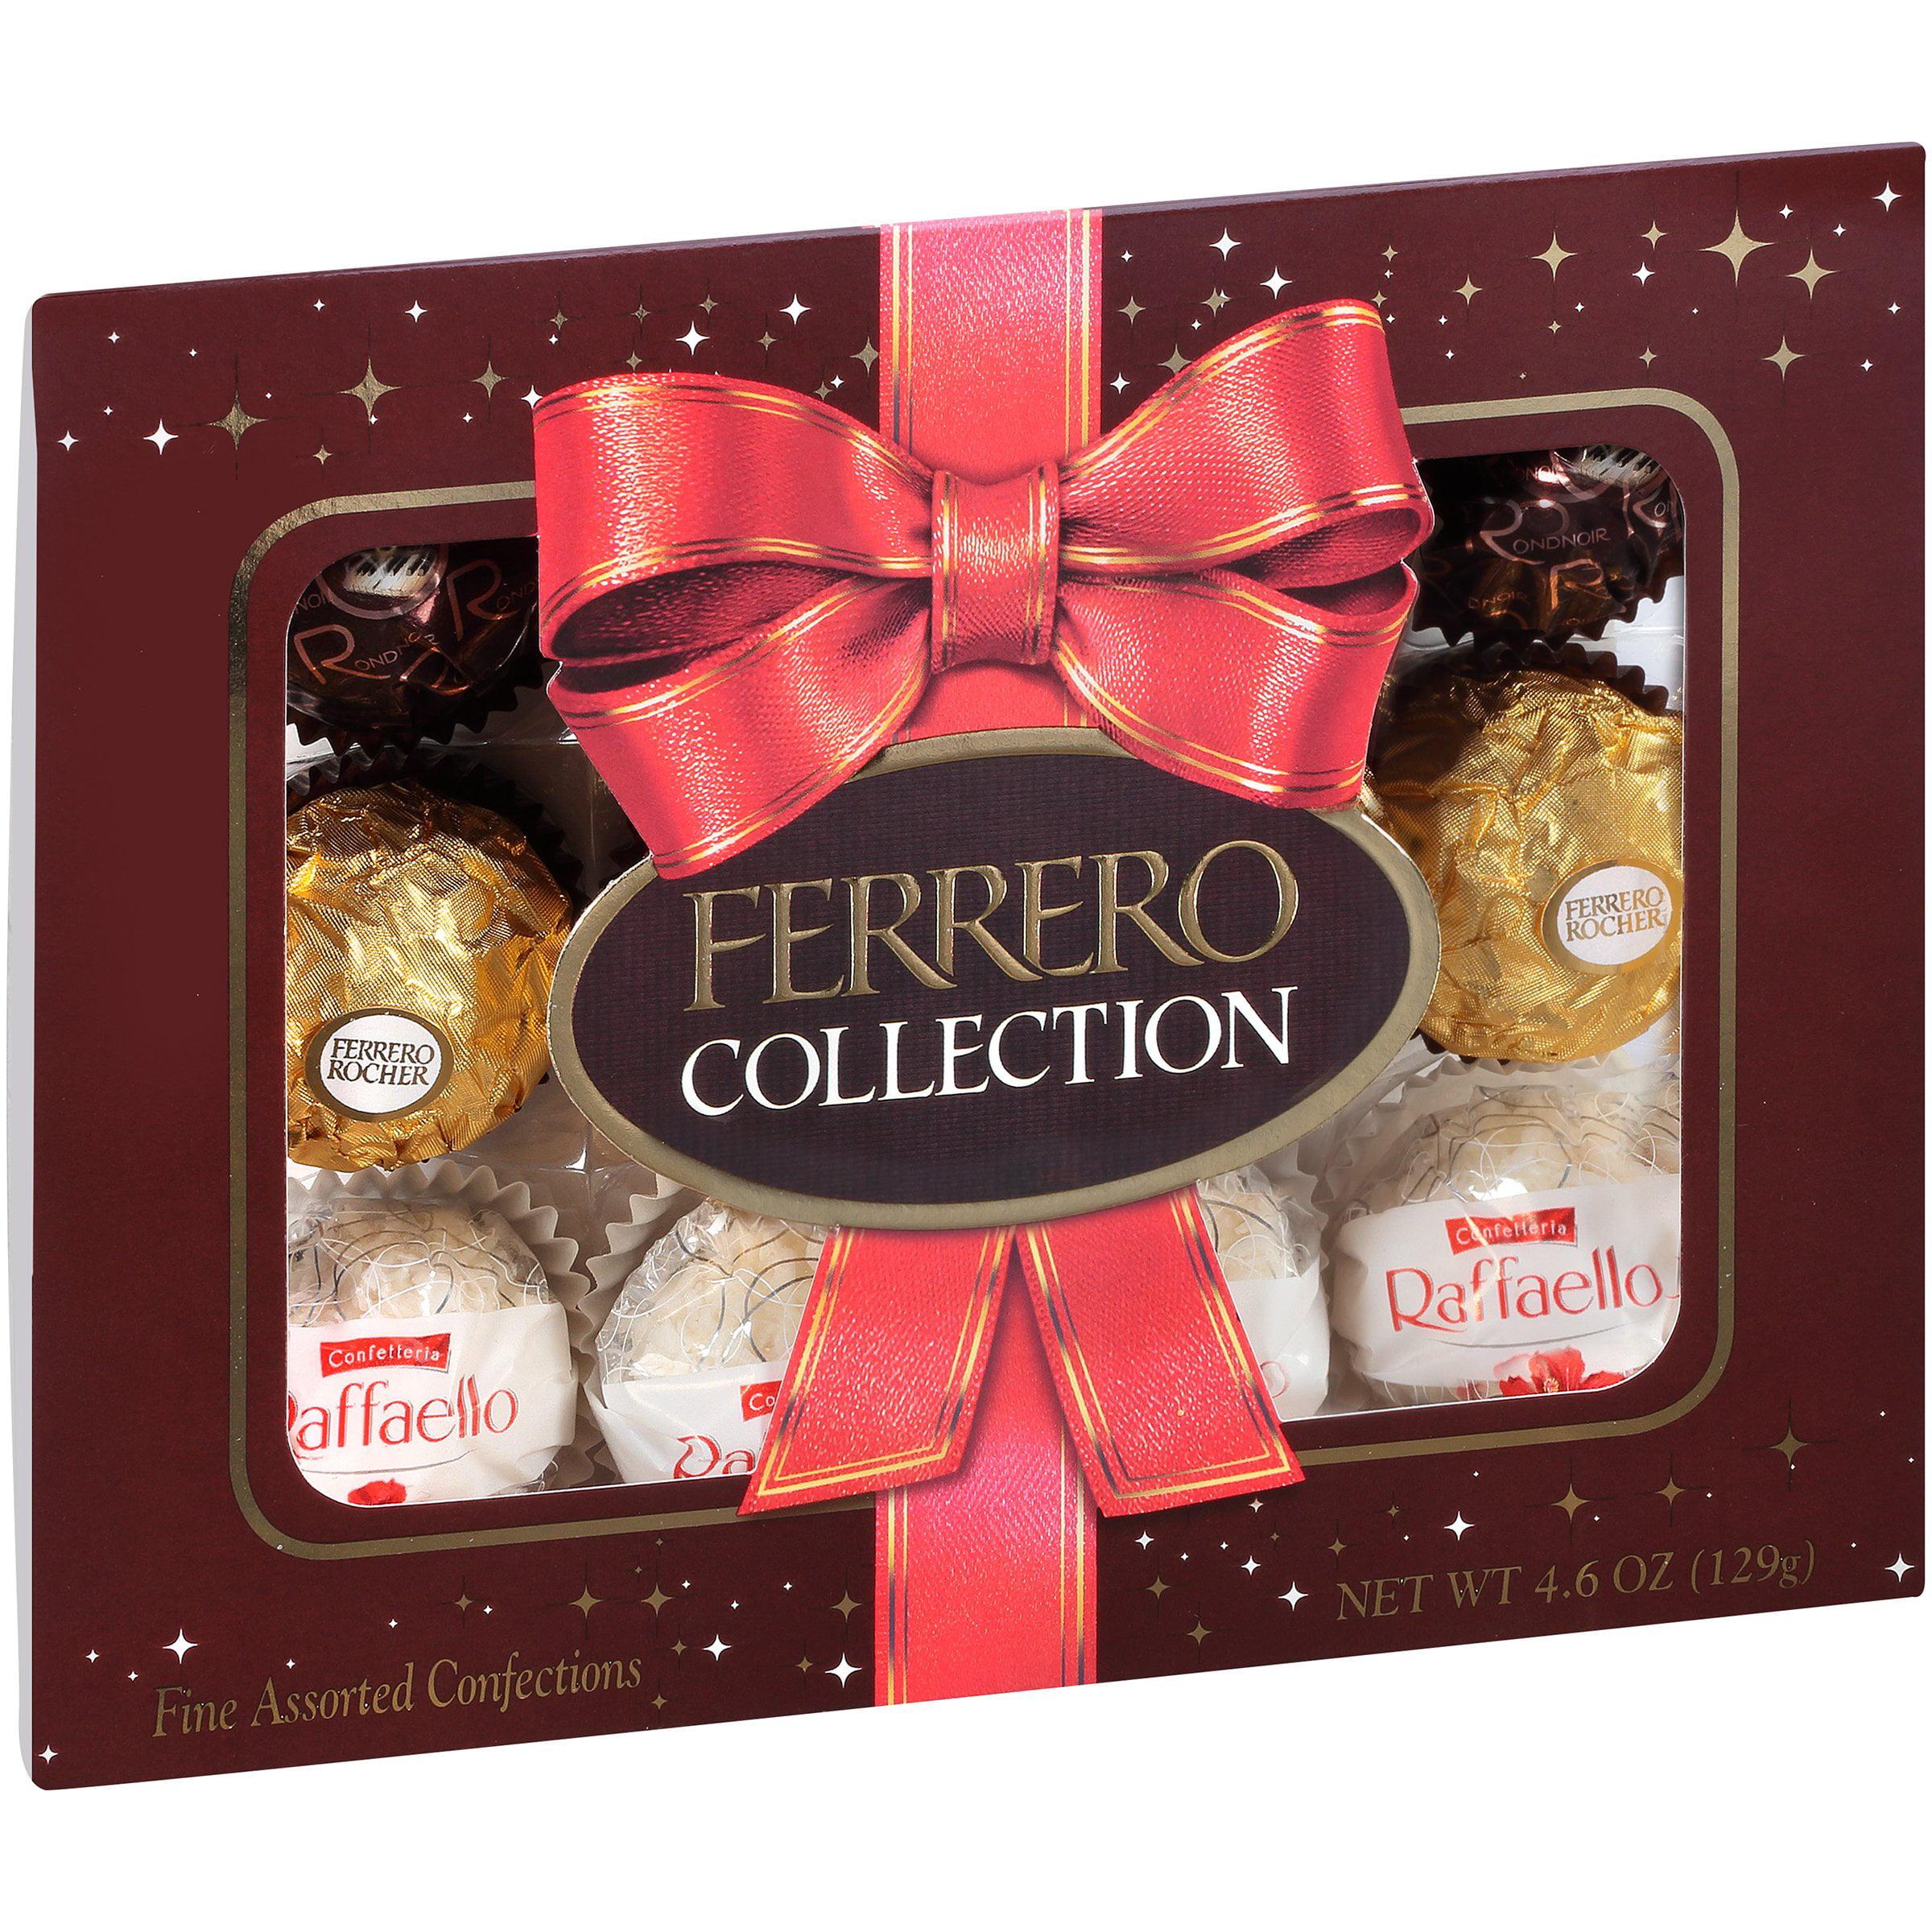 (12 Piece) Ferrero Collection Fine Assorted Confections, 4.6 oz